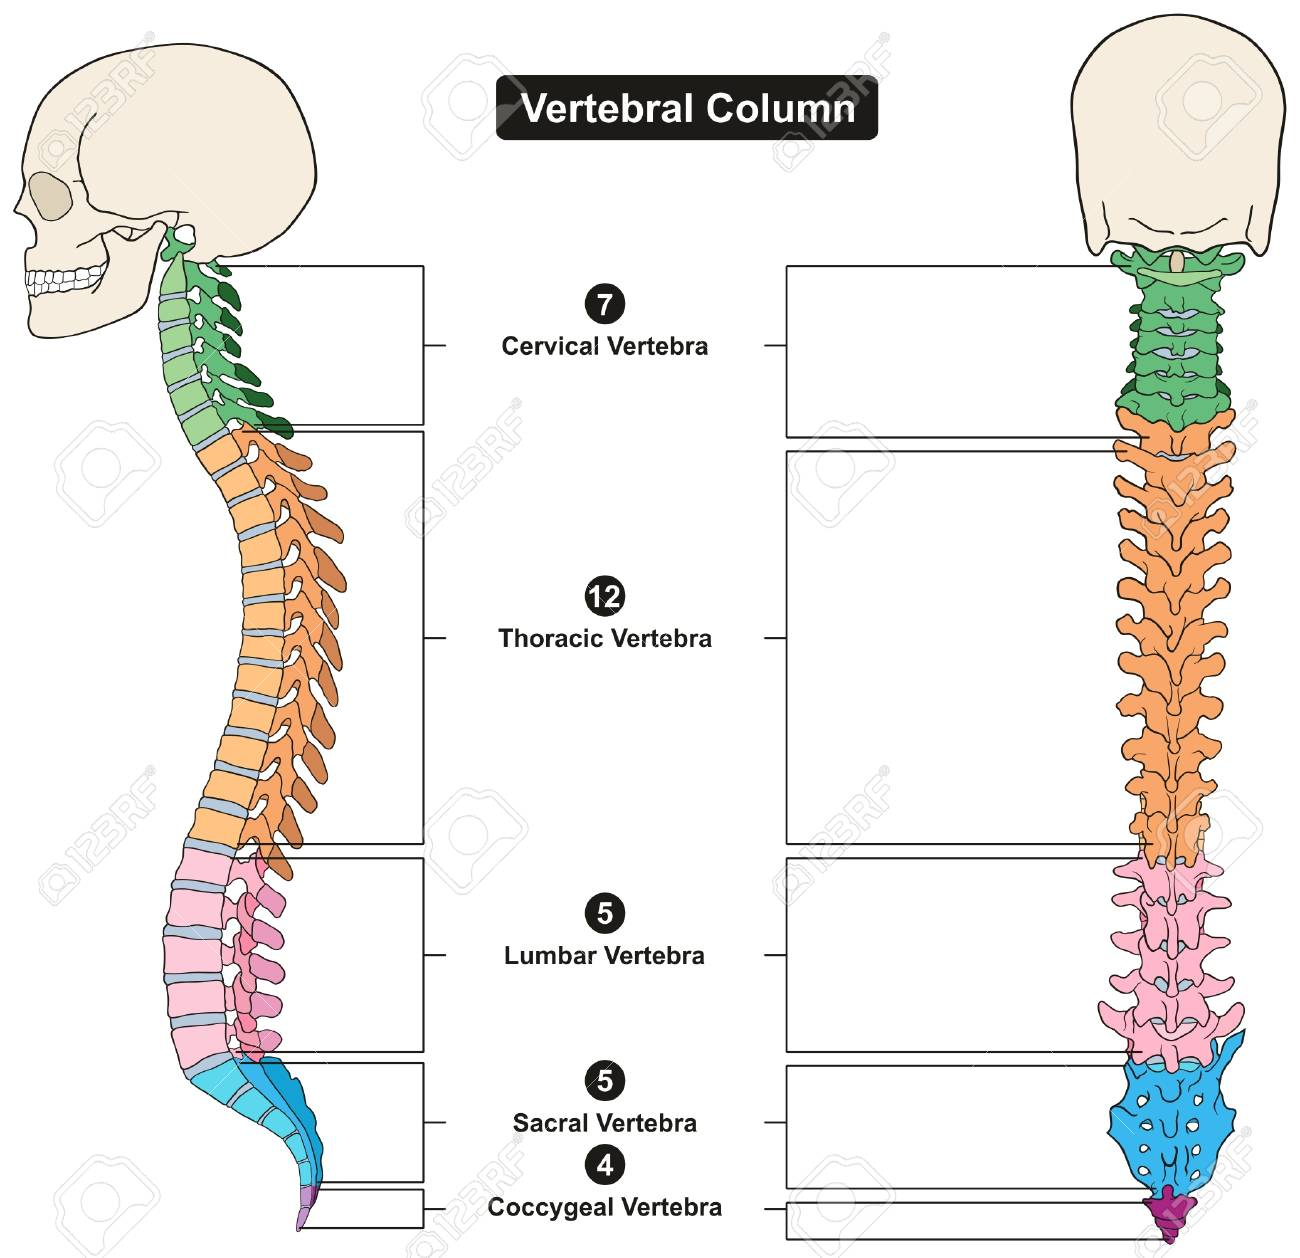 Diagrama Columna Vertebral Humana - Download Wiring Diagrams •